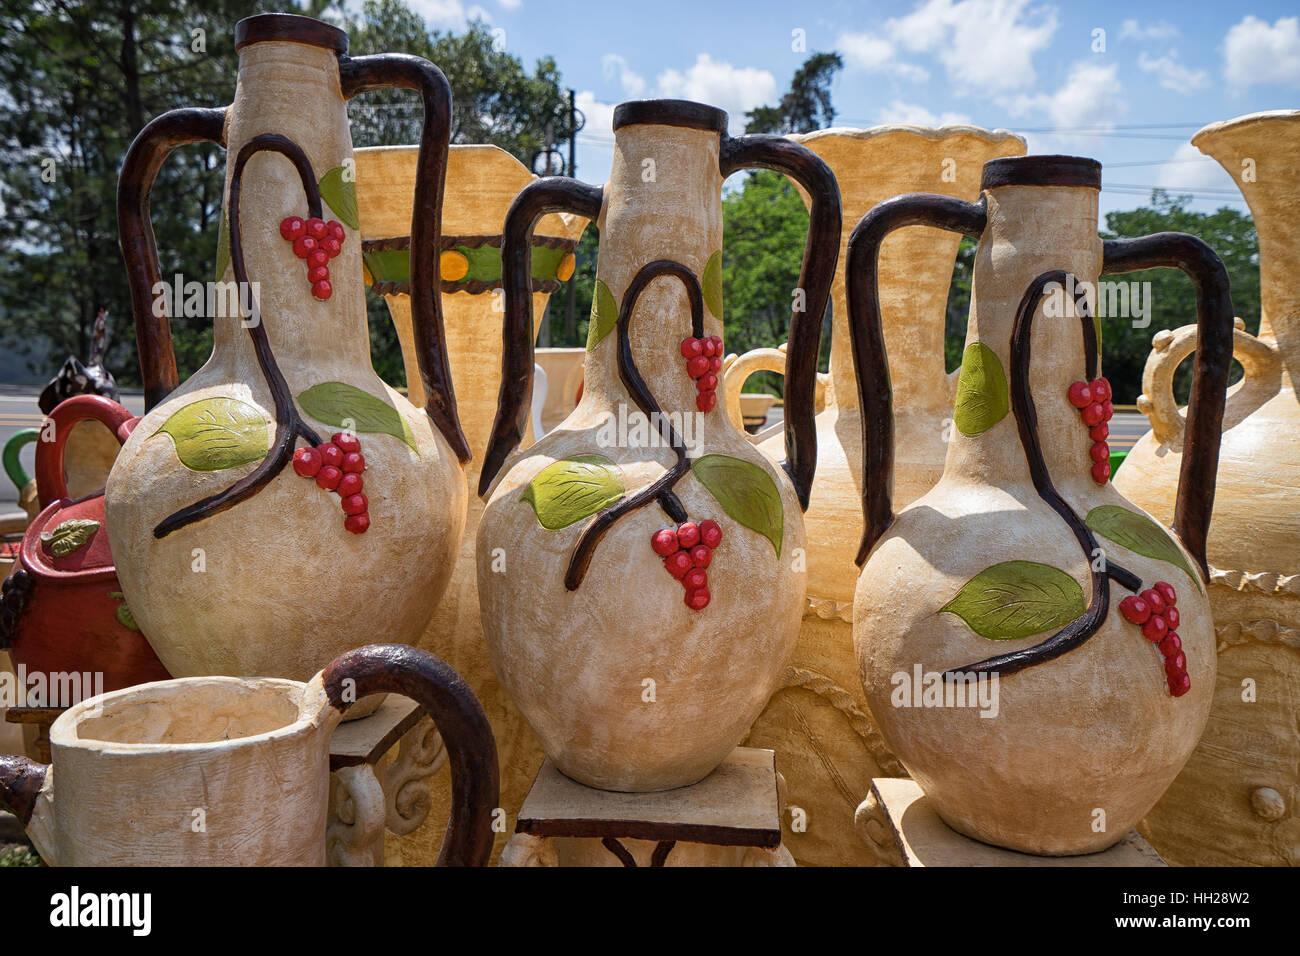 Large decorative ceramic vases, pottery stand in Honduras - Stock Image